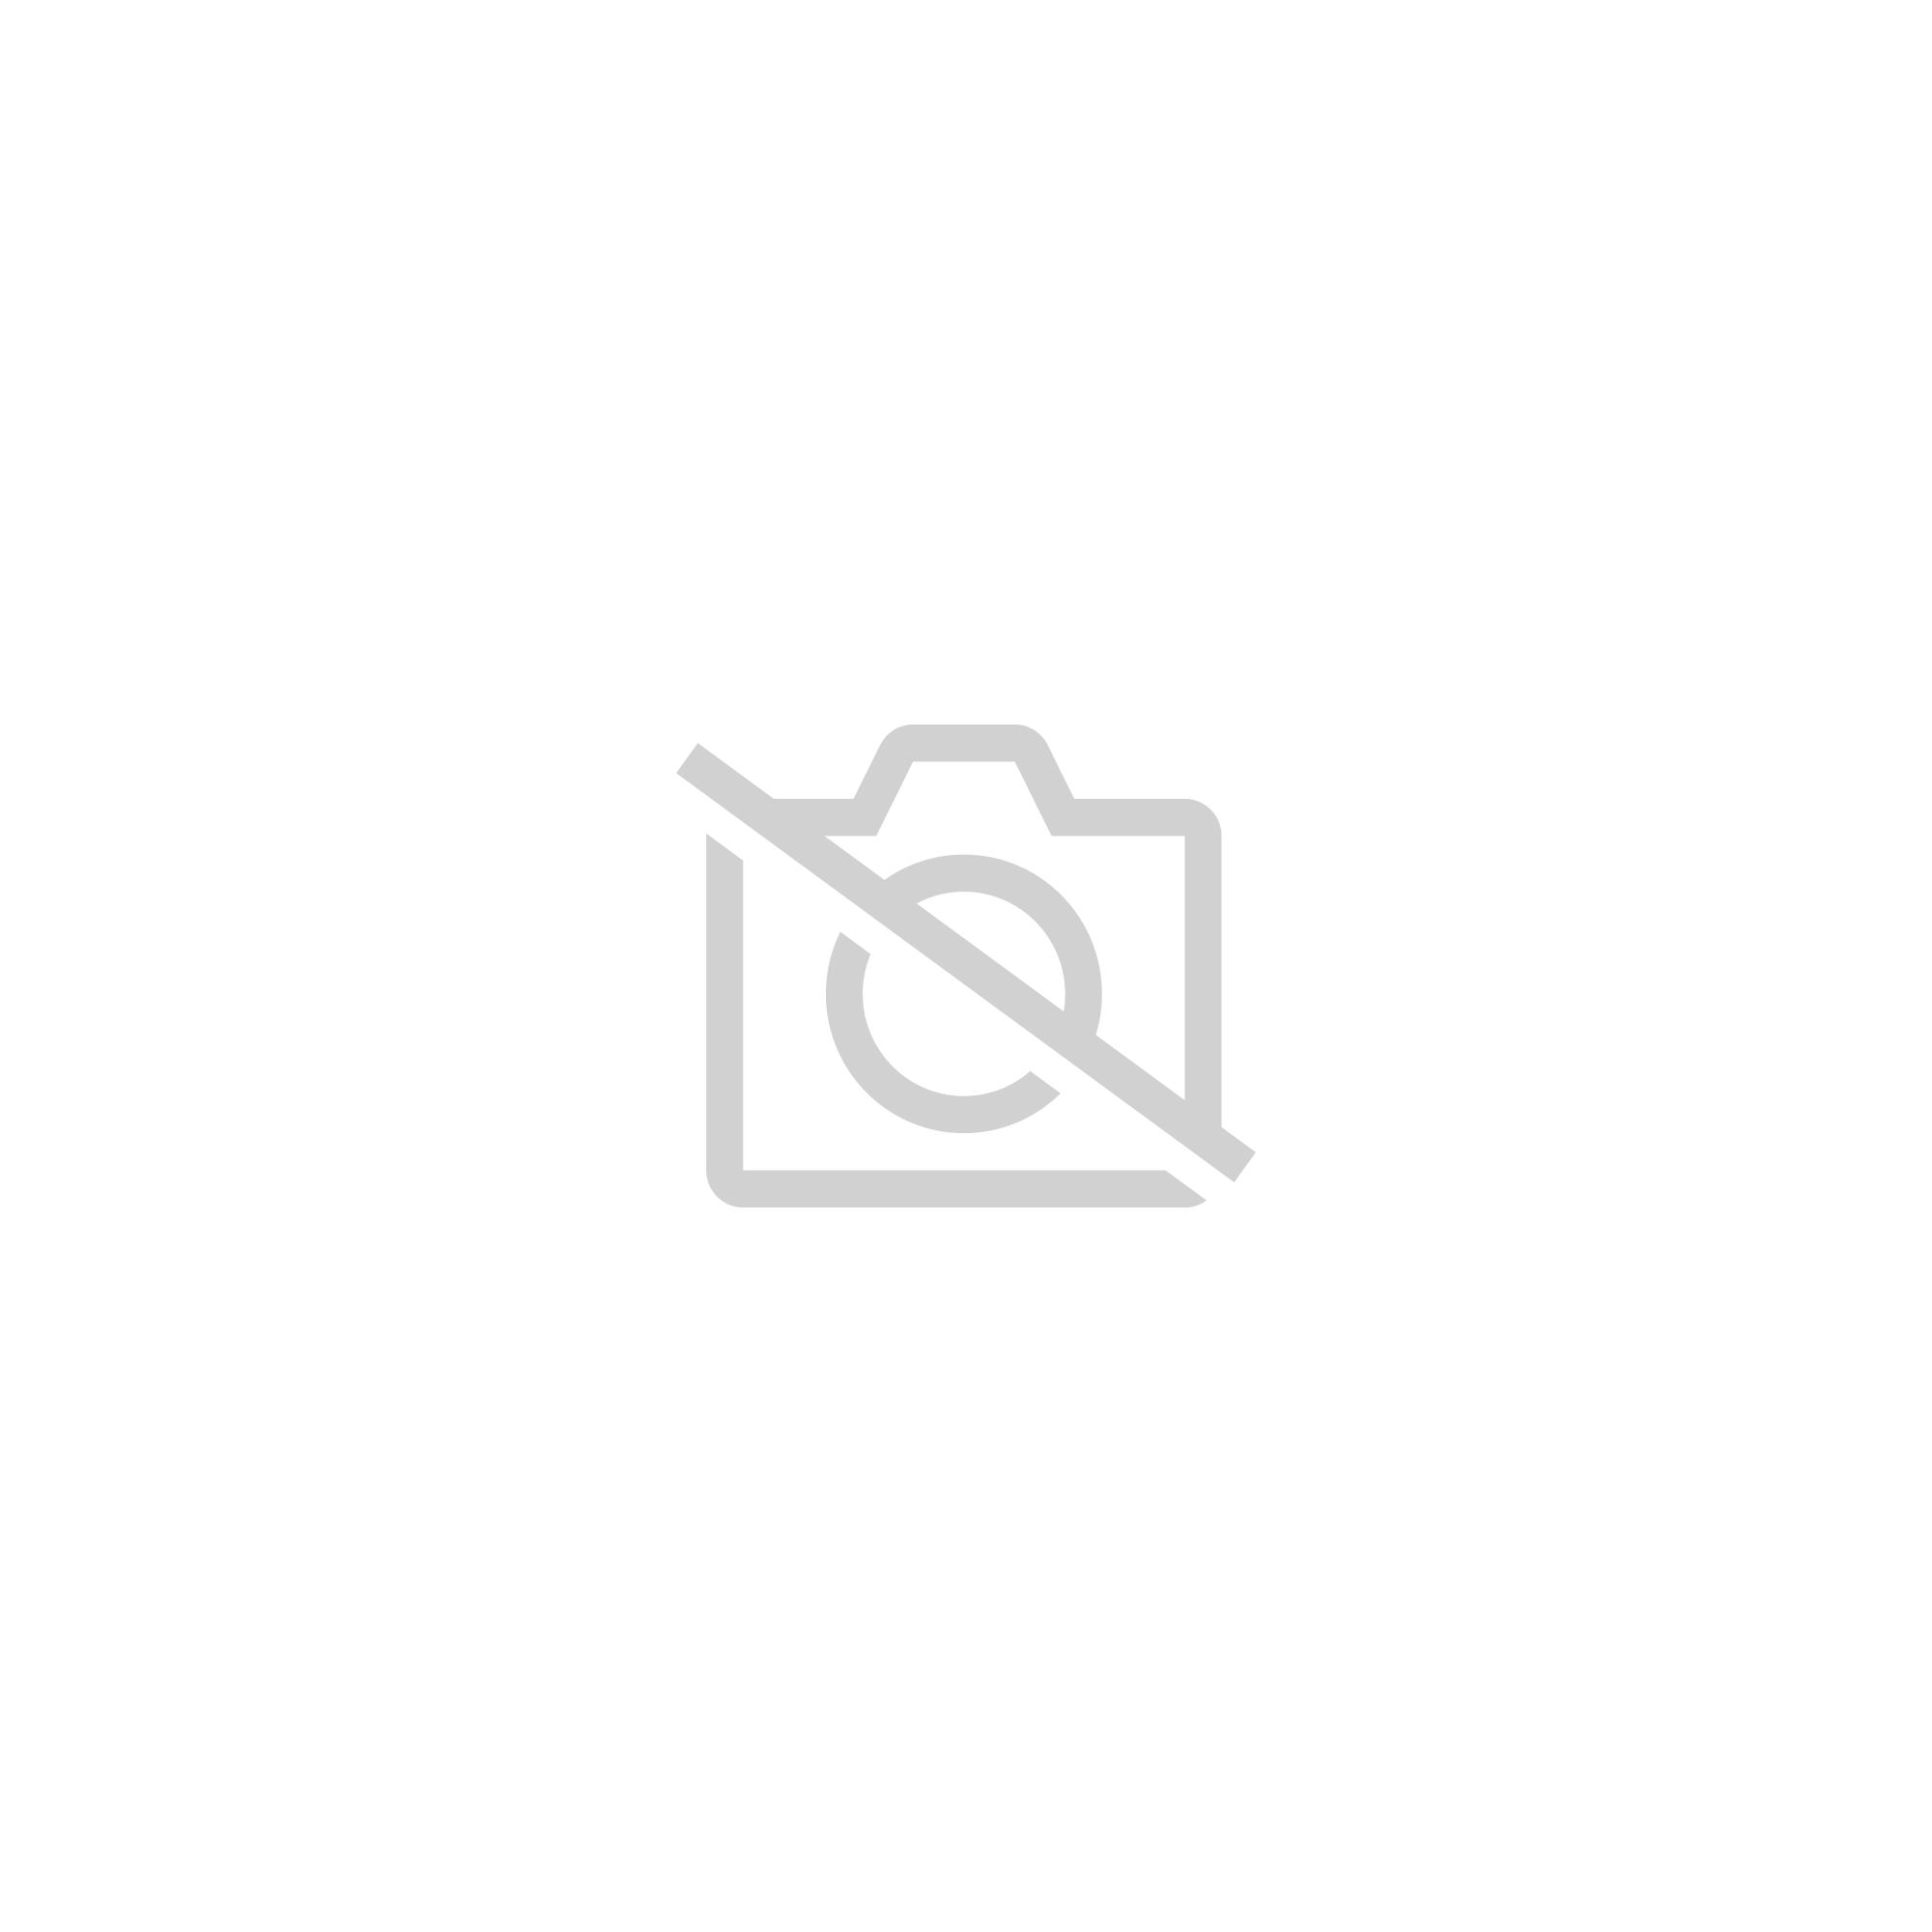 48000mah solaire batterie externe chargeur 2 ports usb. Black Bedroom Furniture Sets. Home Design Ideas